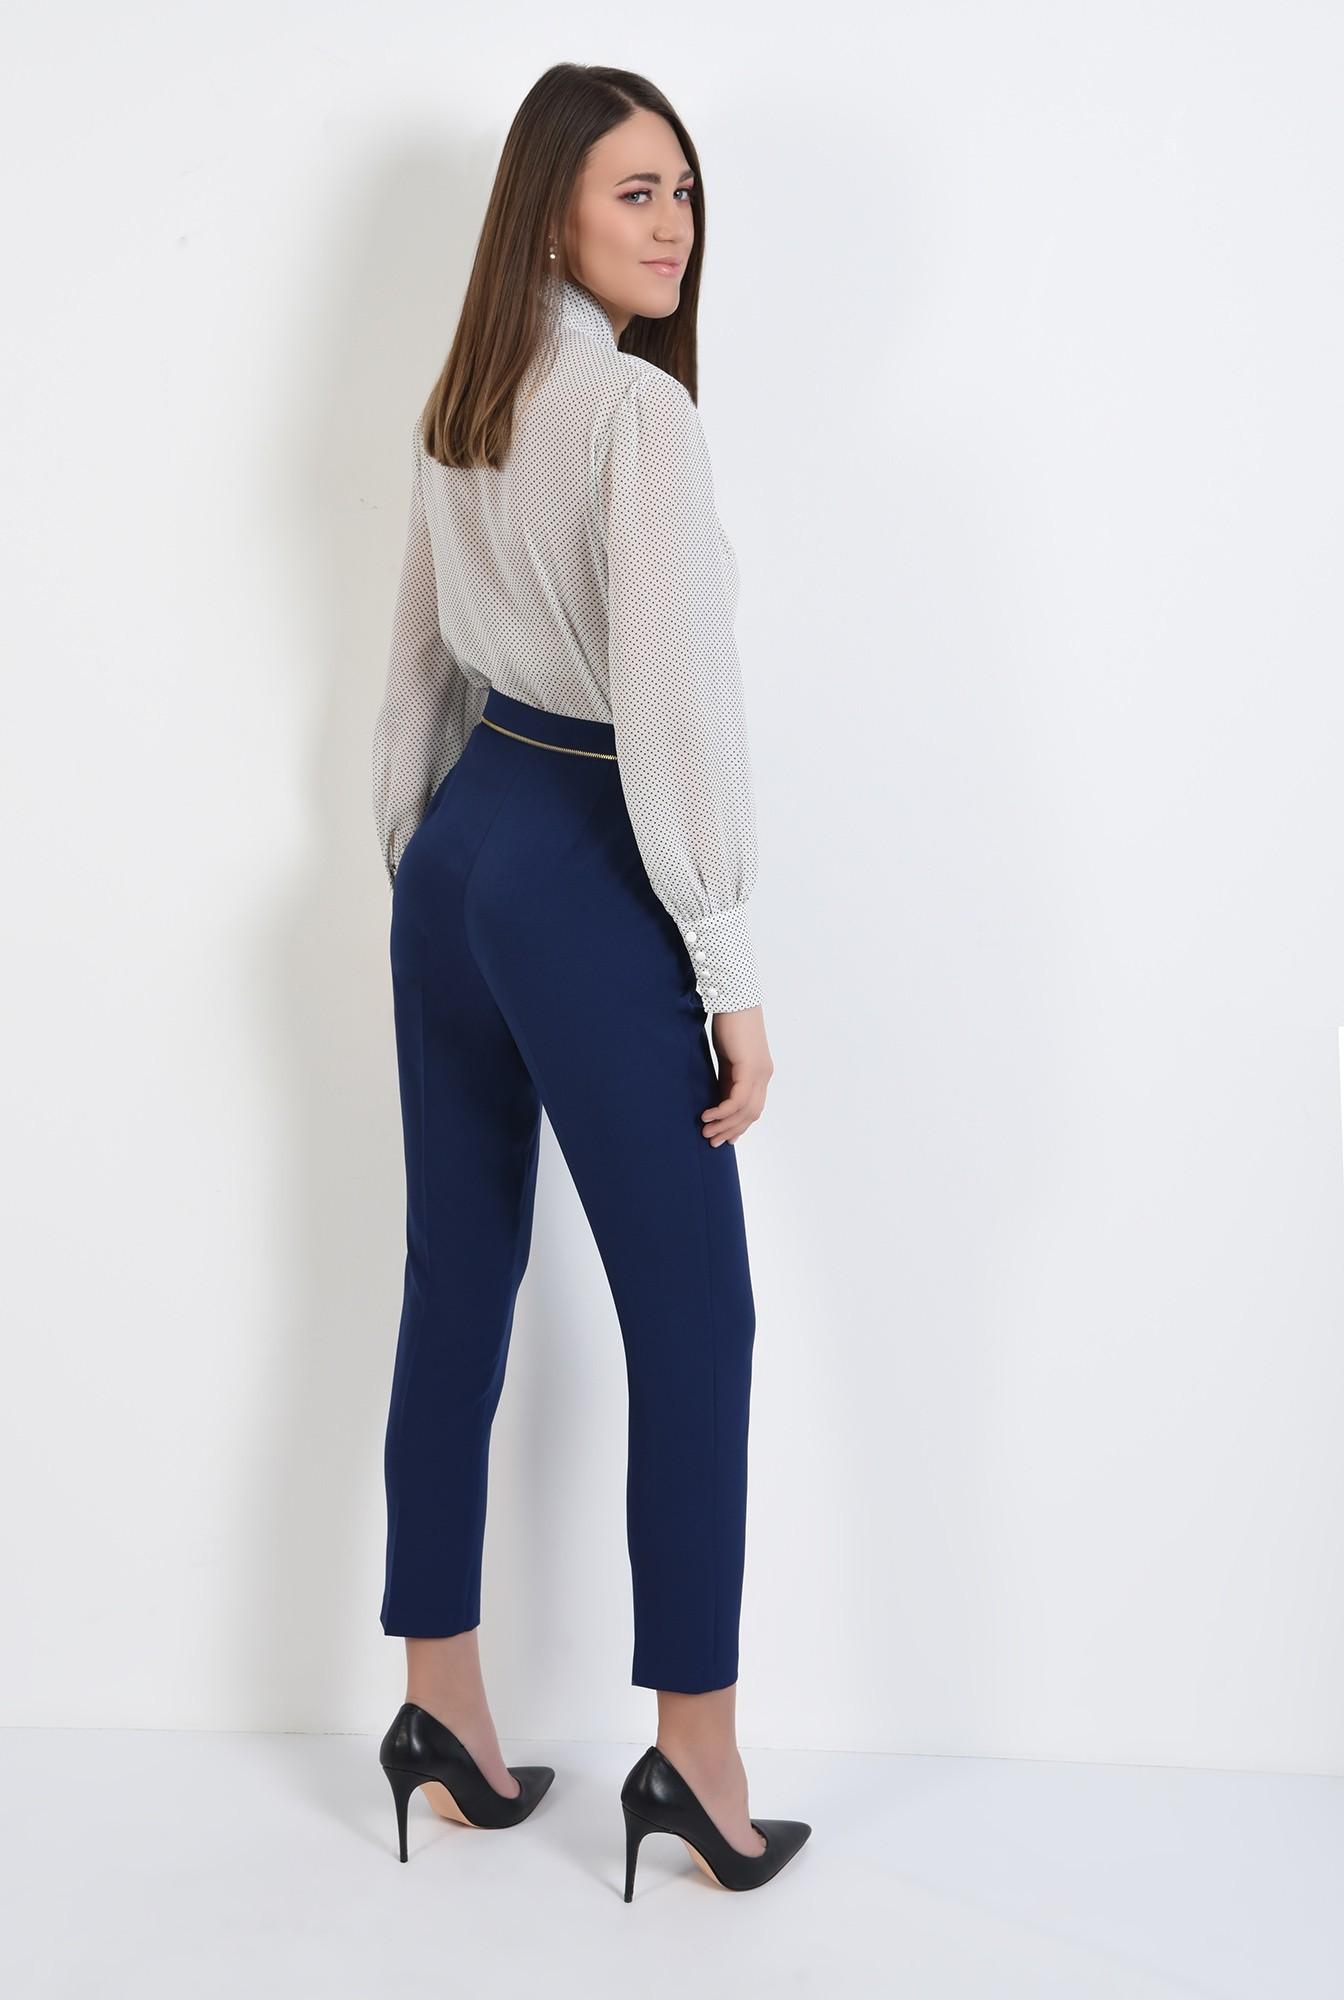 1 - pantaloni office, bleumarin, talie medie, cu buzunare, pantaloni de primavara